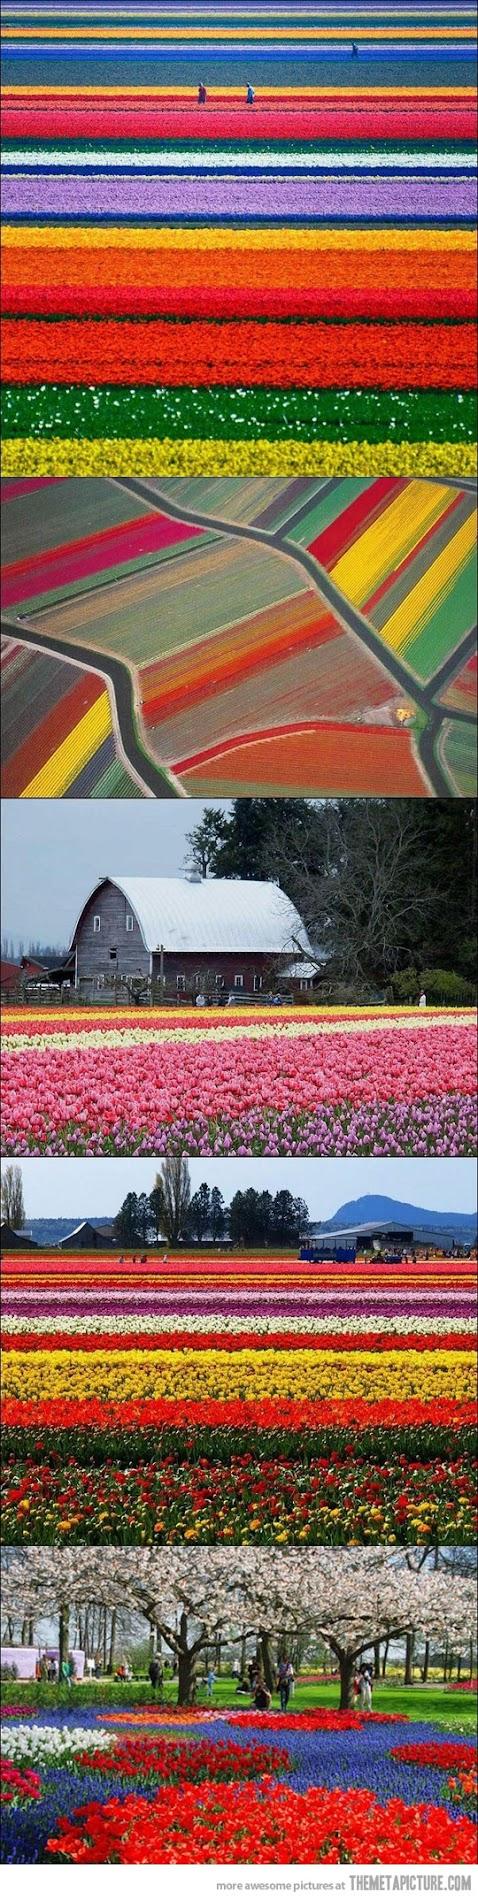 netherlands fields